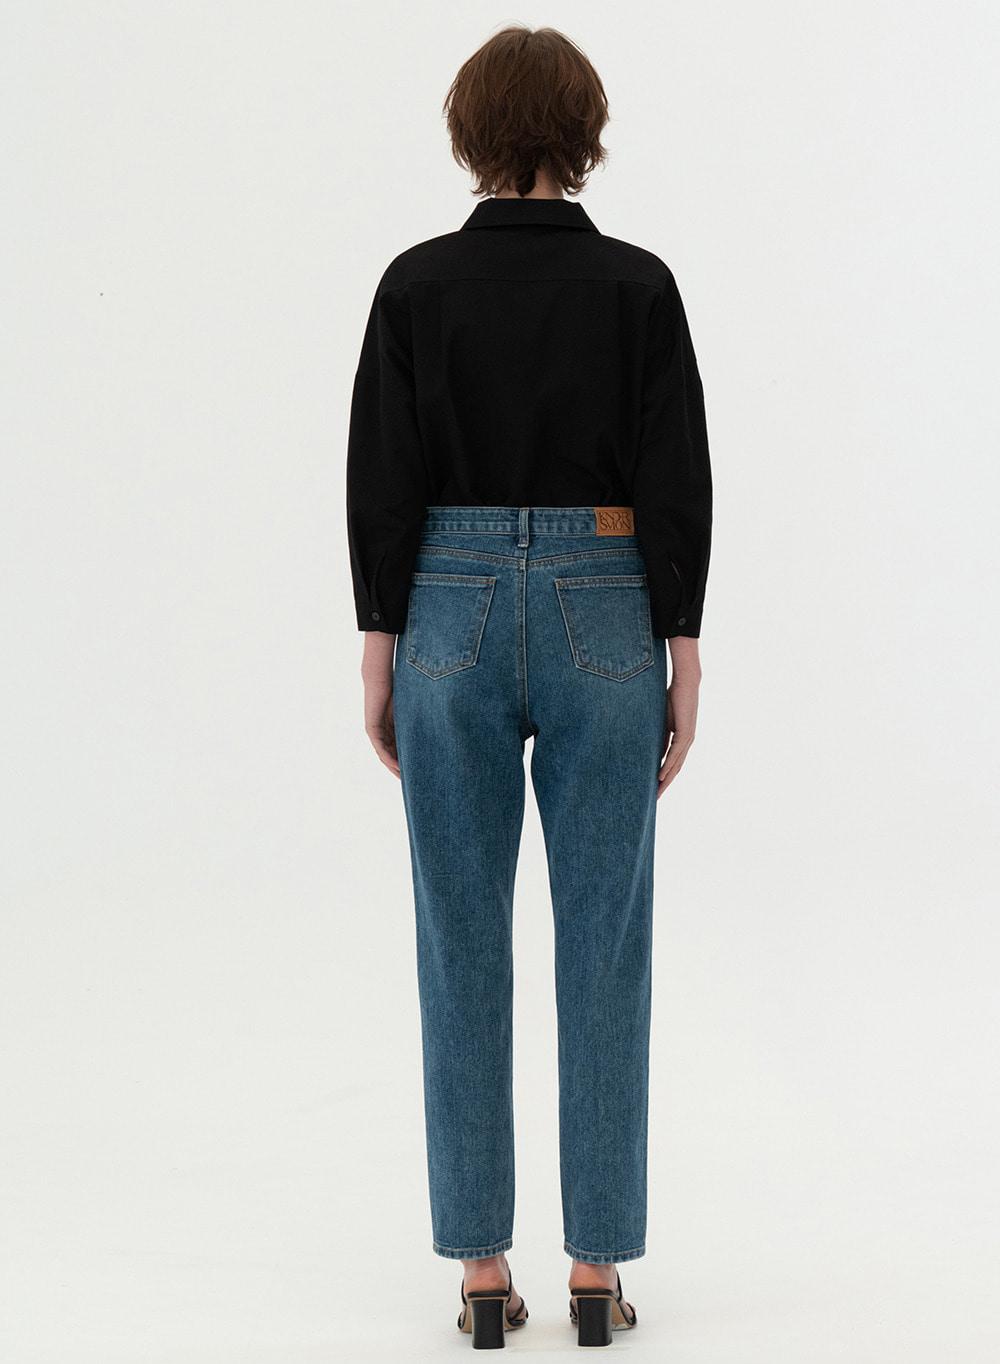 [ESSENTIAL] Triple Stitch Jeans Washed-blue